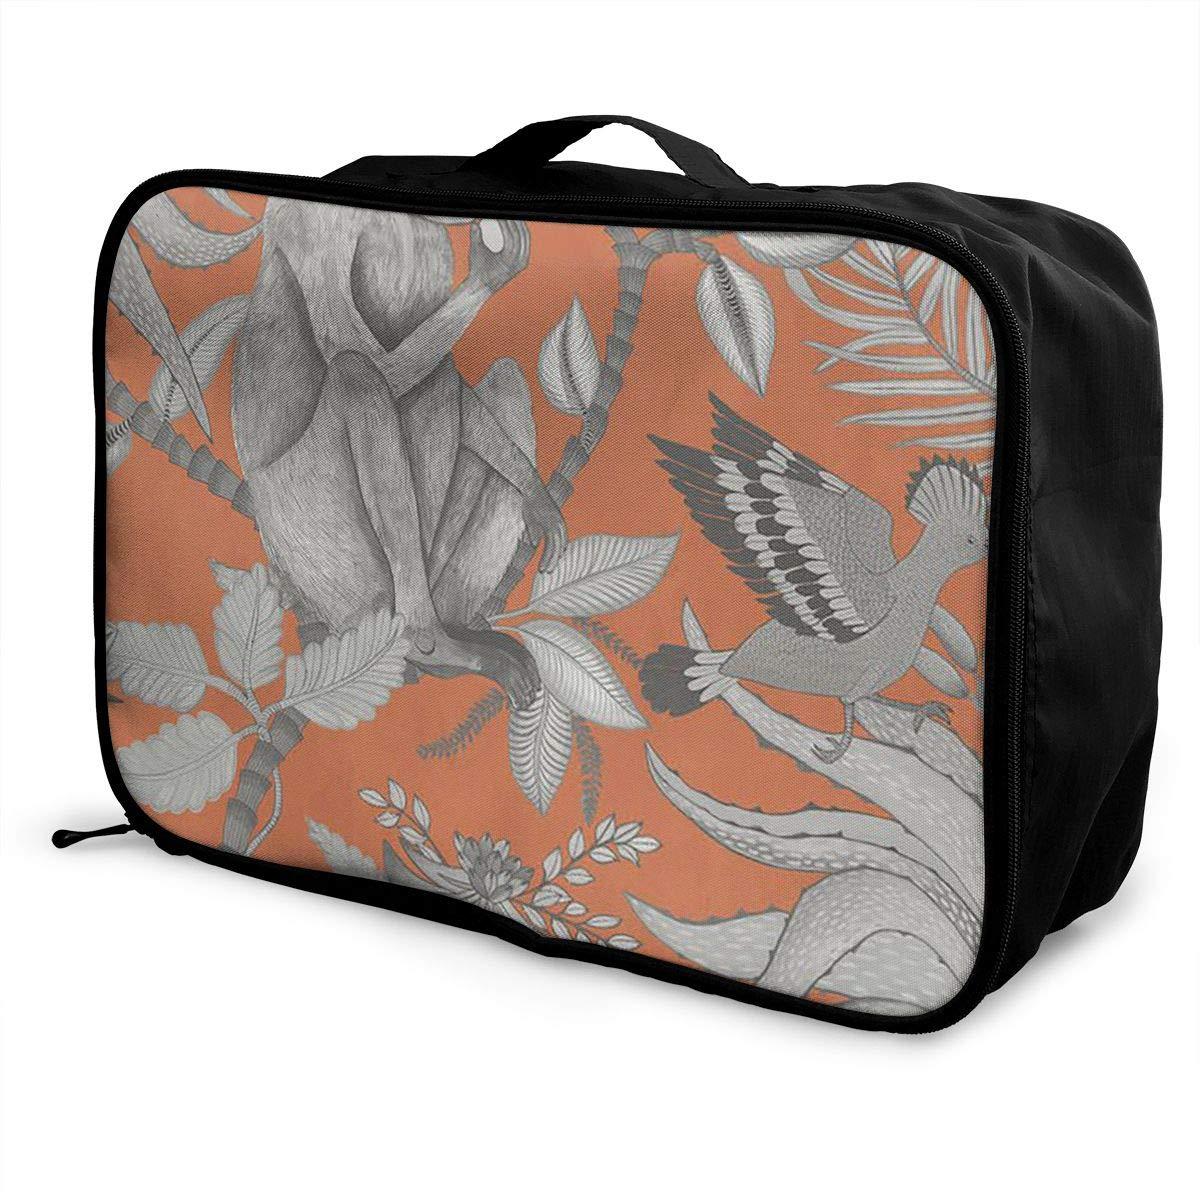 Travel Luggage Duffle Bag Lightweight Portable Handbag Monkey Bird Orange Print Large Capacity Waterproof Foldable Storage Tote